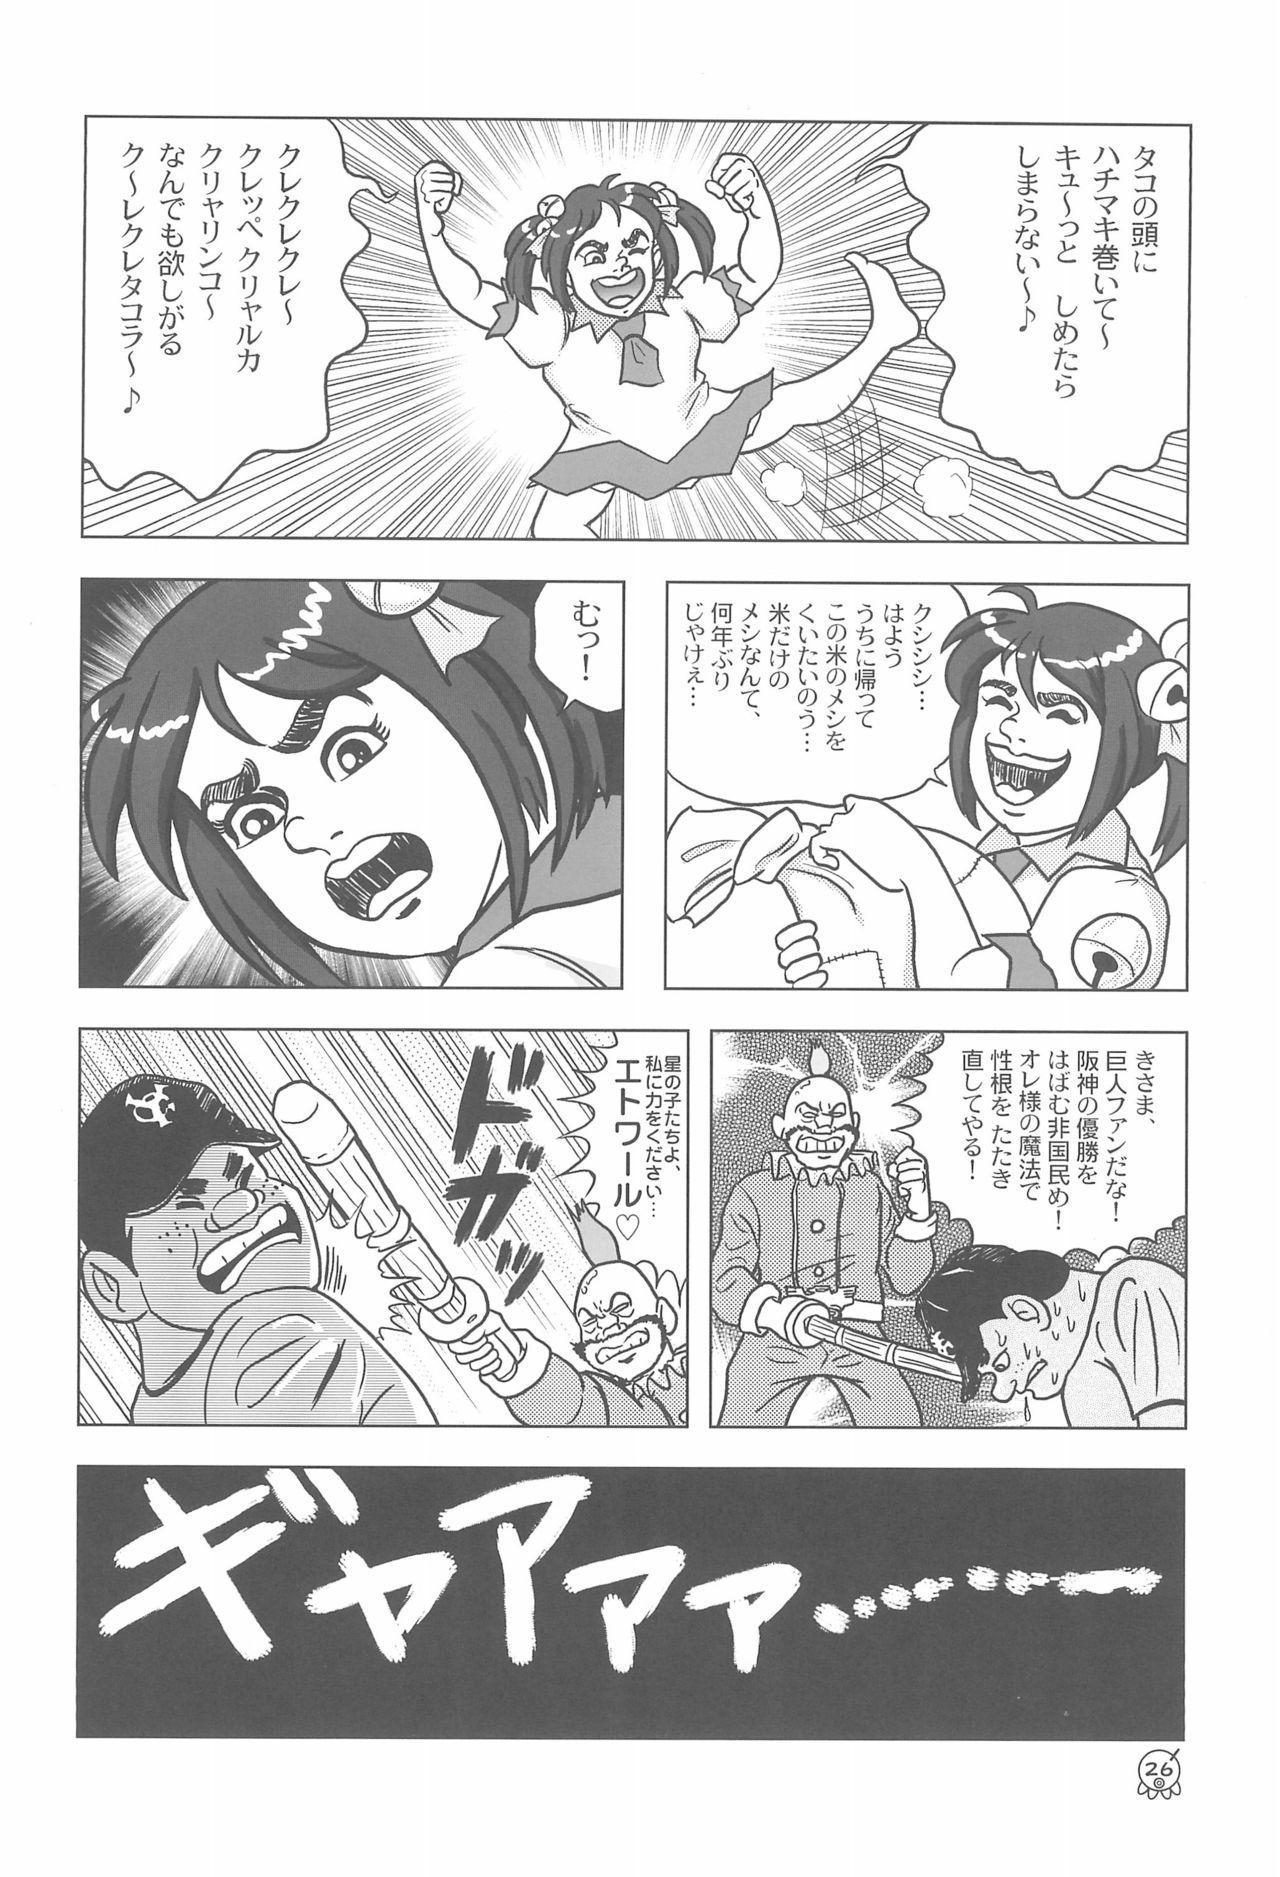 TakoMari BOOK 27